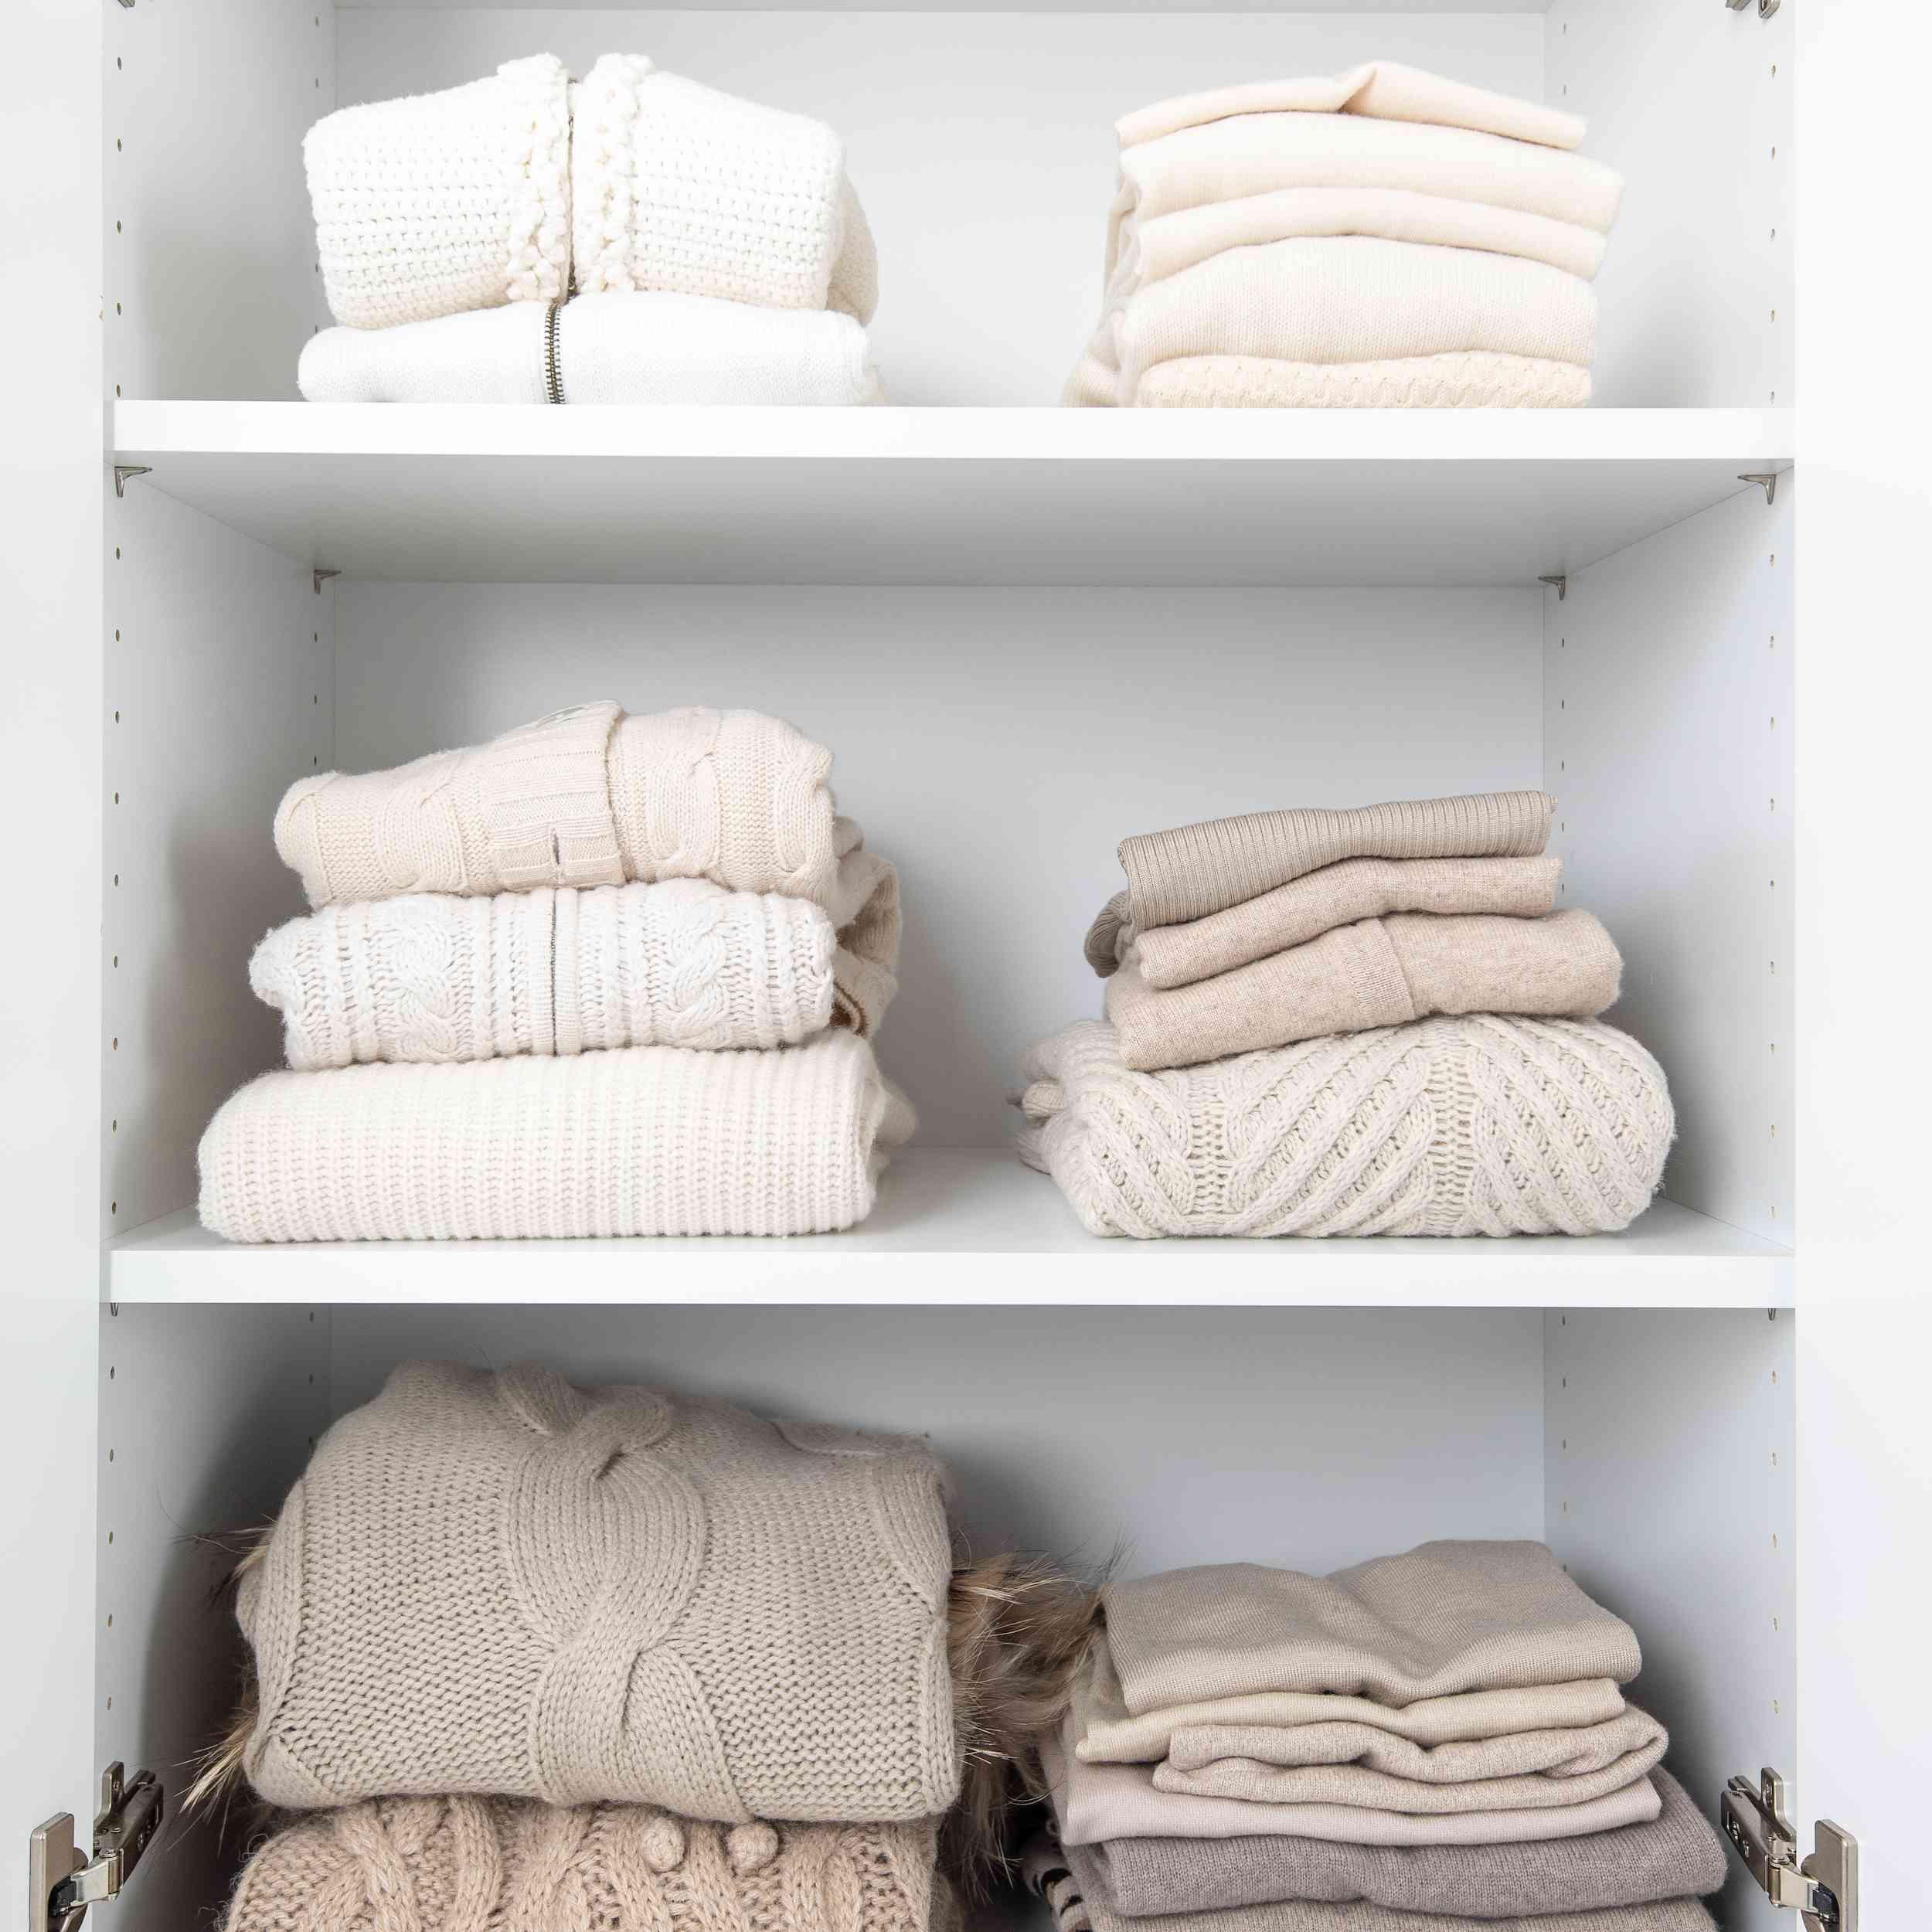 Folded sweaters in a closet